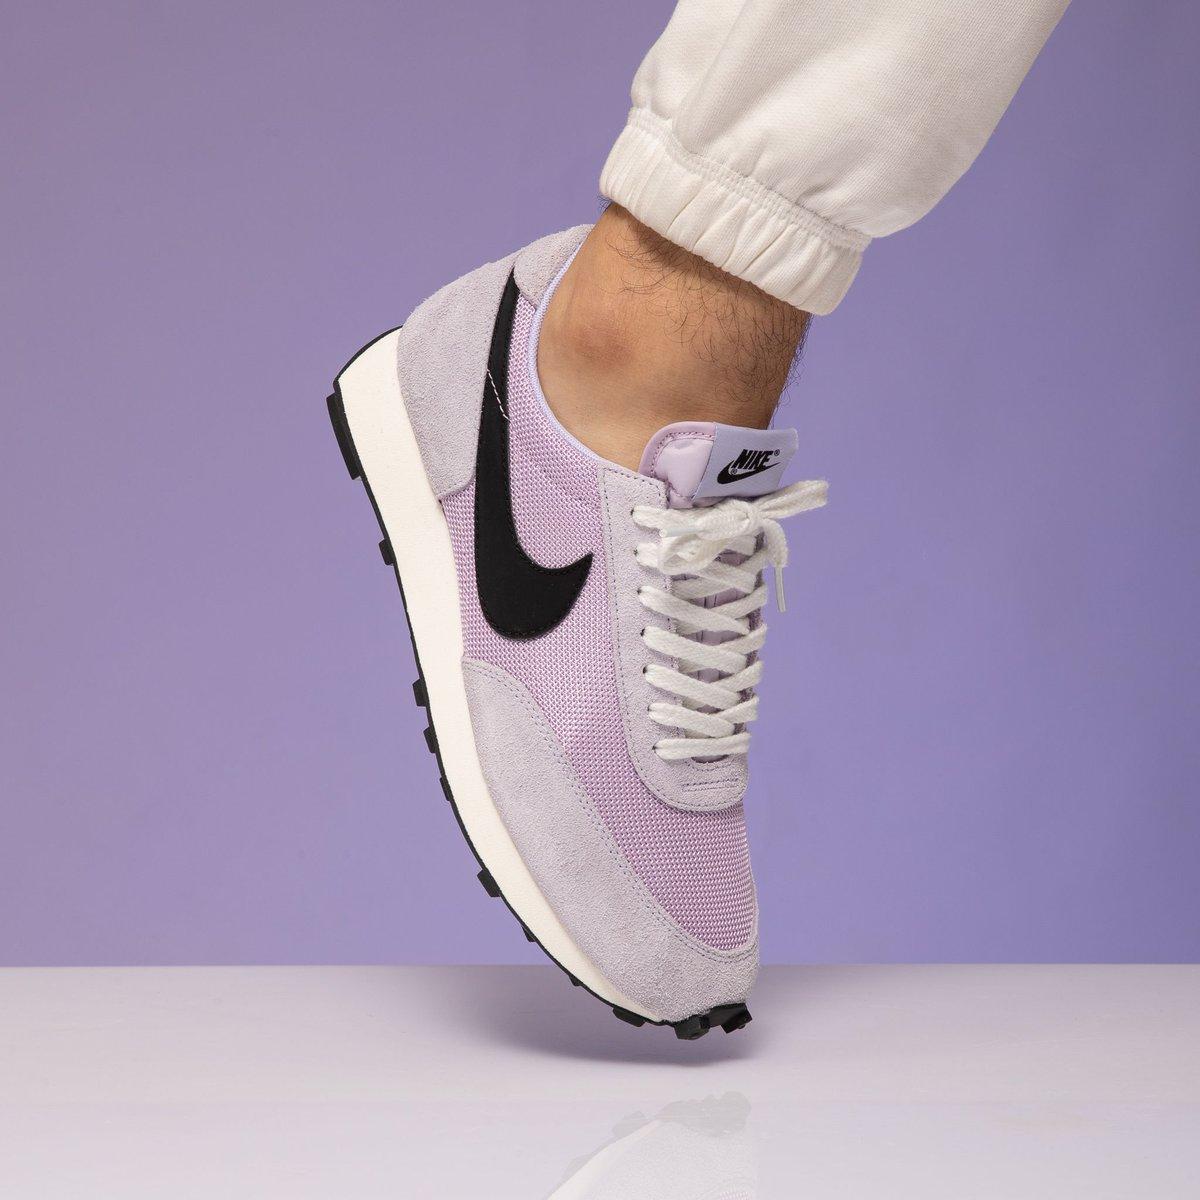 "Nike Daybreak SP ""Lavender"": Sale Price: $59.97 (Retail $100)  – FREE SHIPPING – use code:  – WINSTREAK –  at checkout"